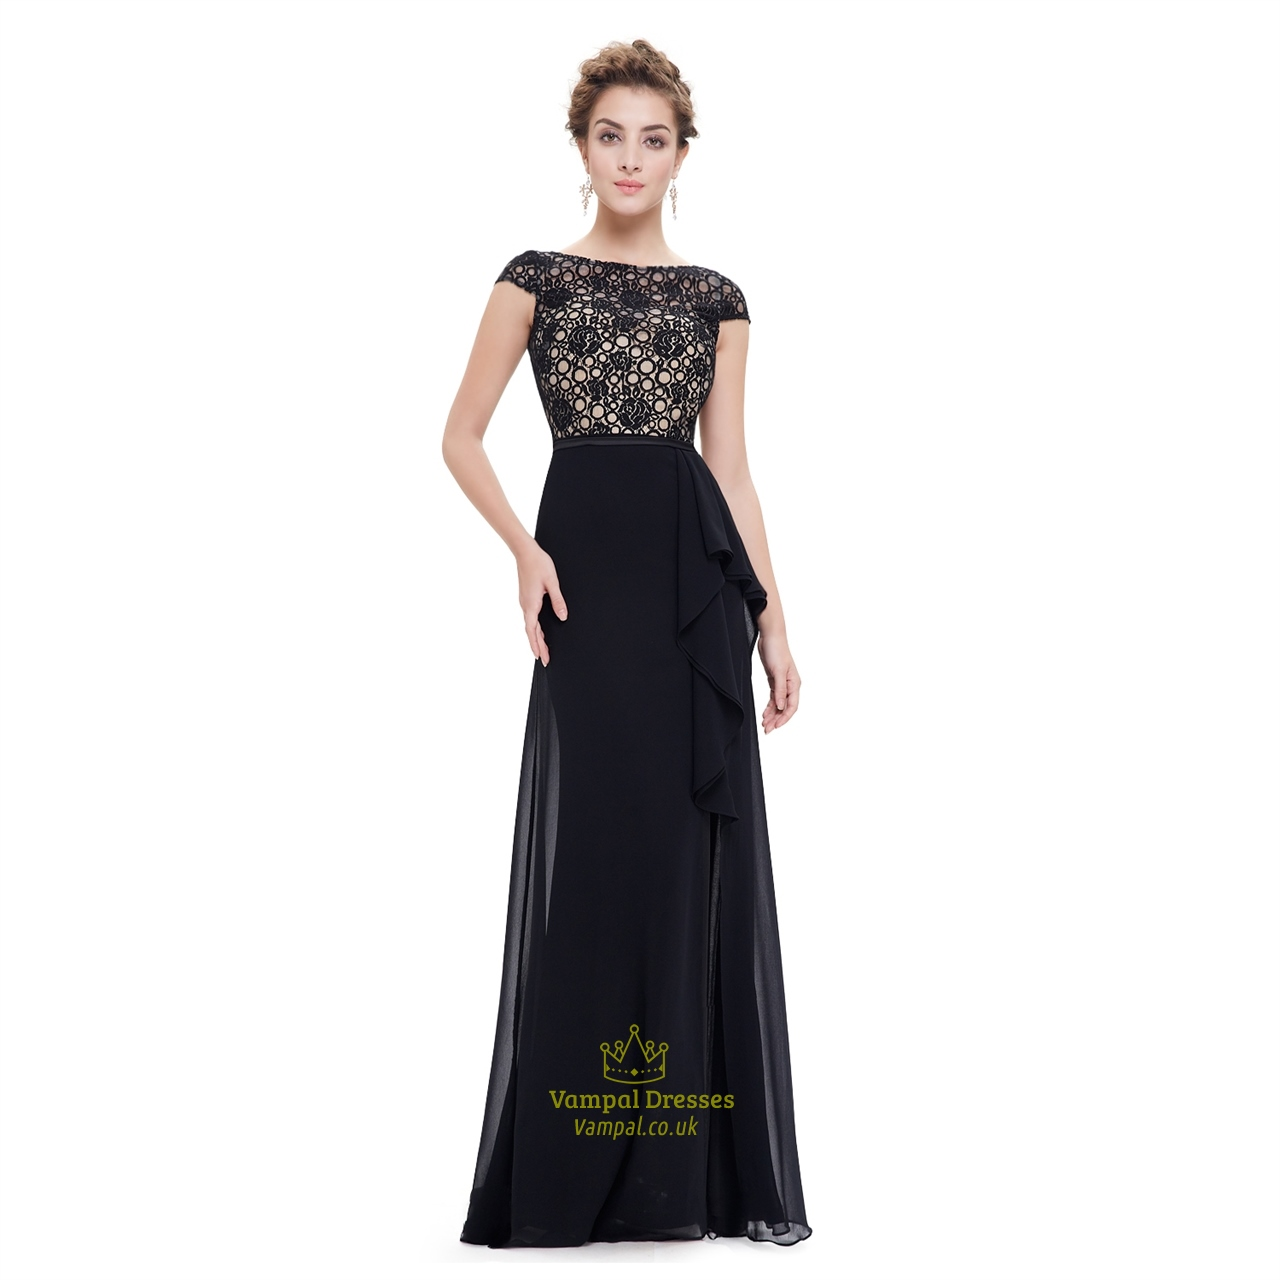 Black lace top formal dresses